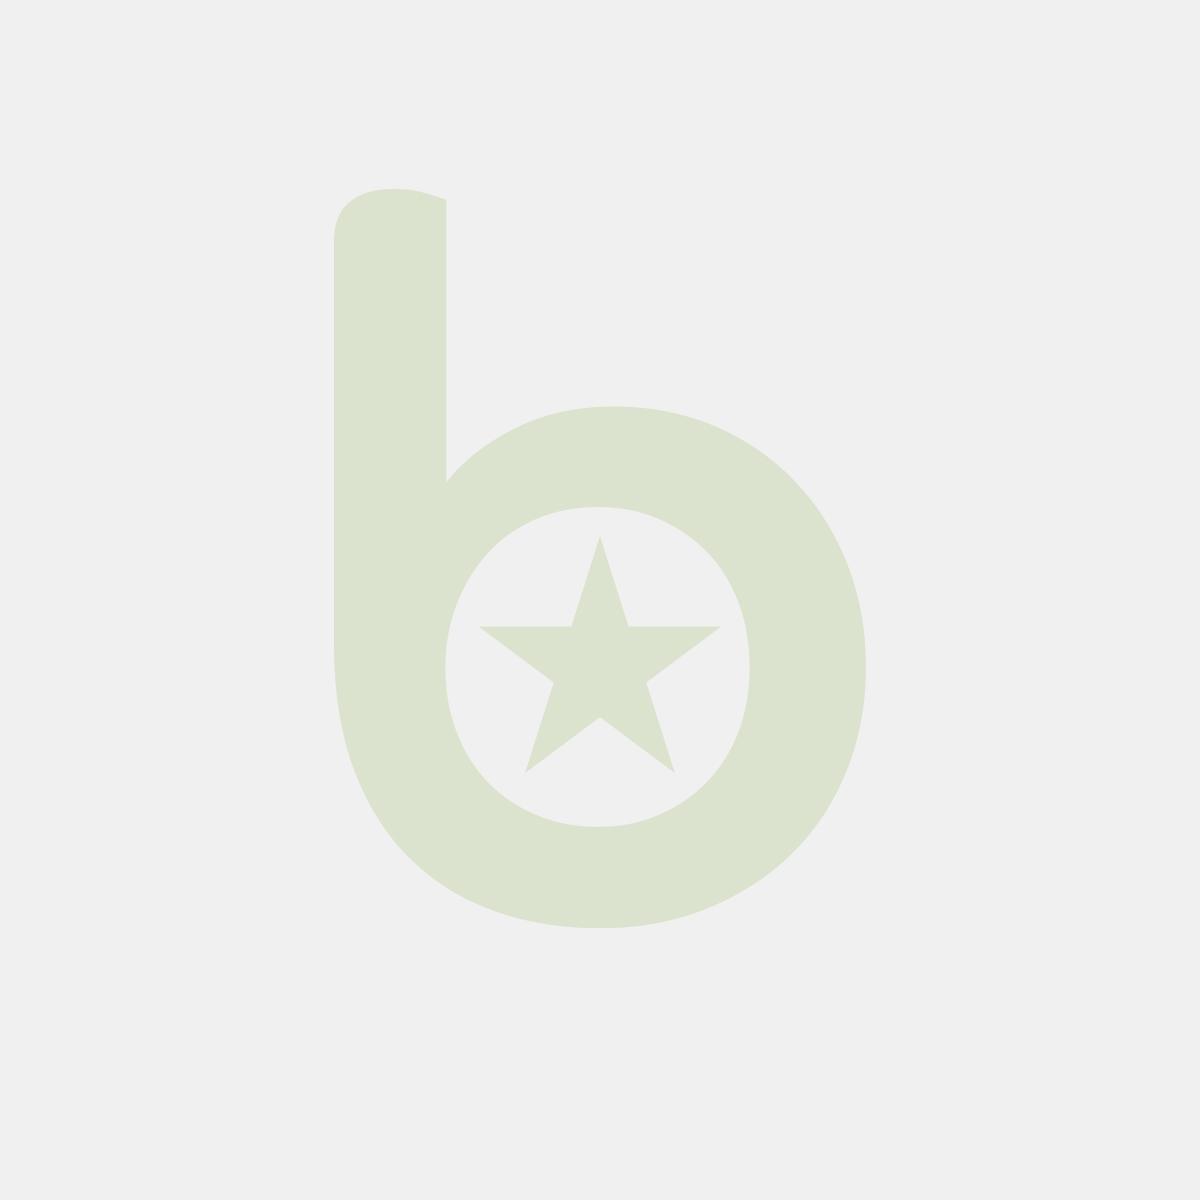 Patera PET cateringowa srebrna 450mm, cena za 25 sztuk